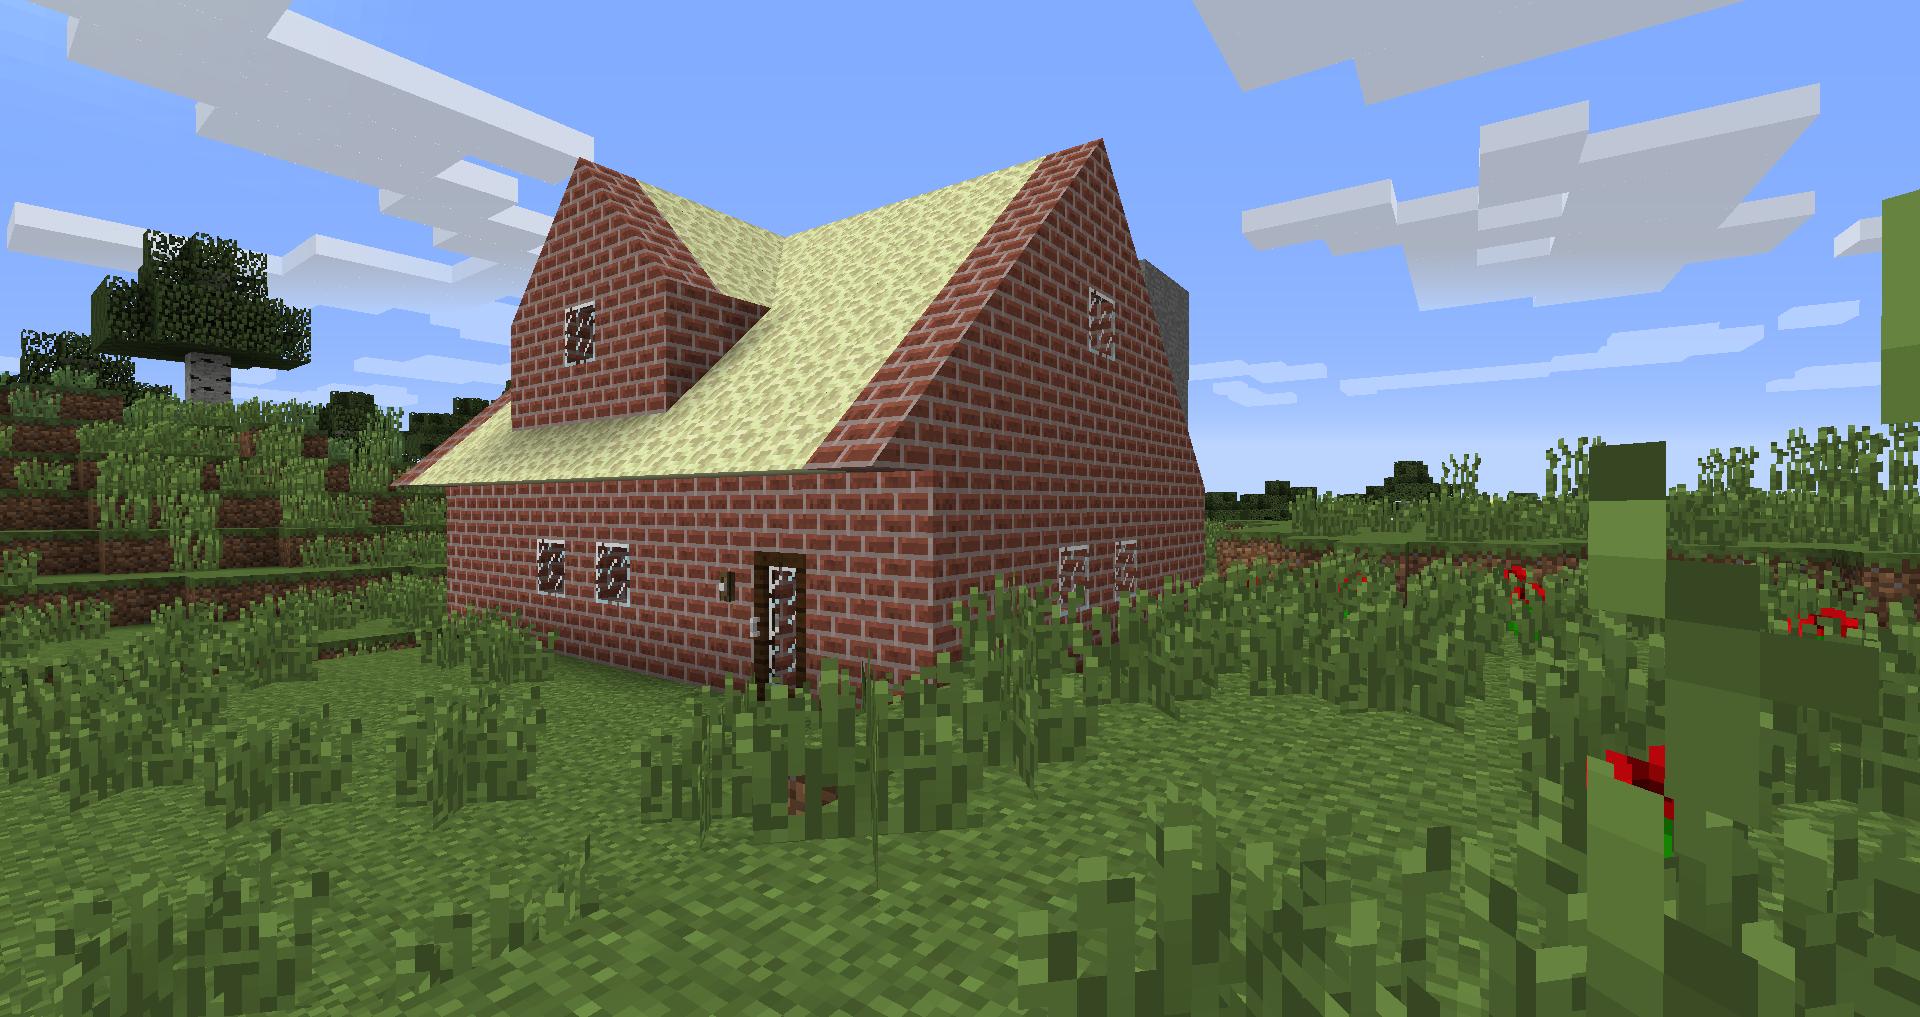 2016 06 04_145830 - Brick House 2016